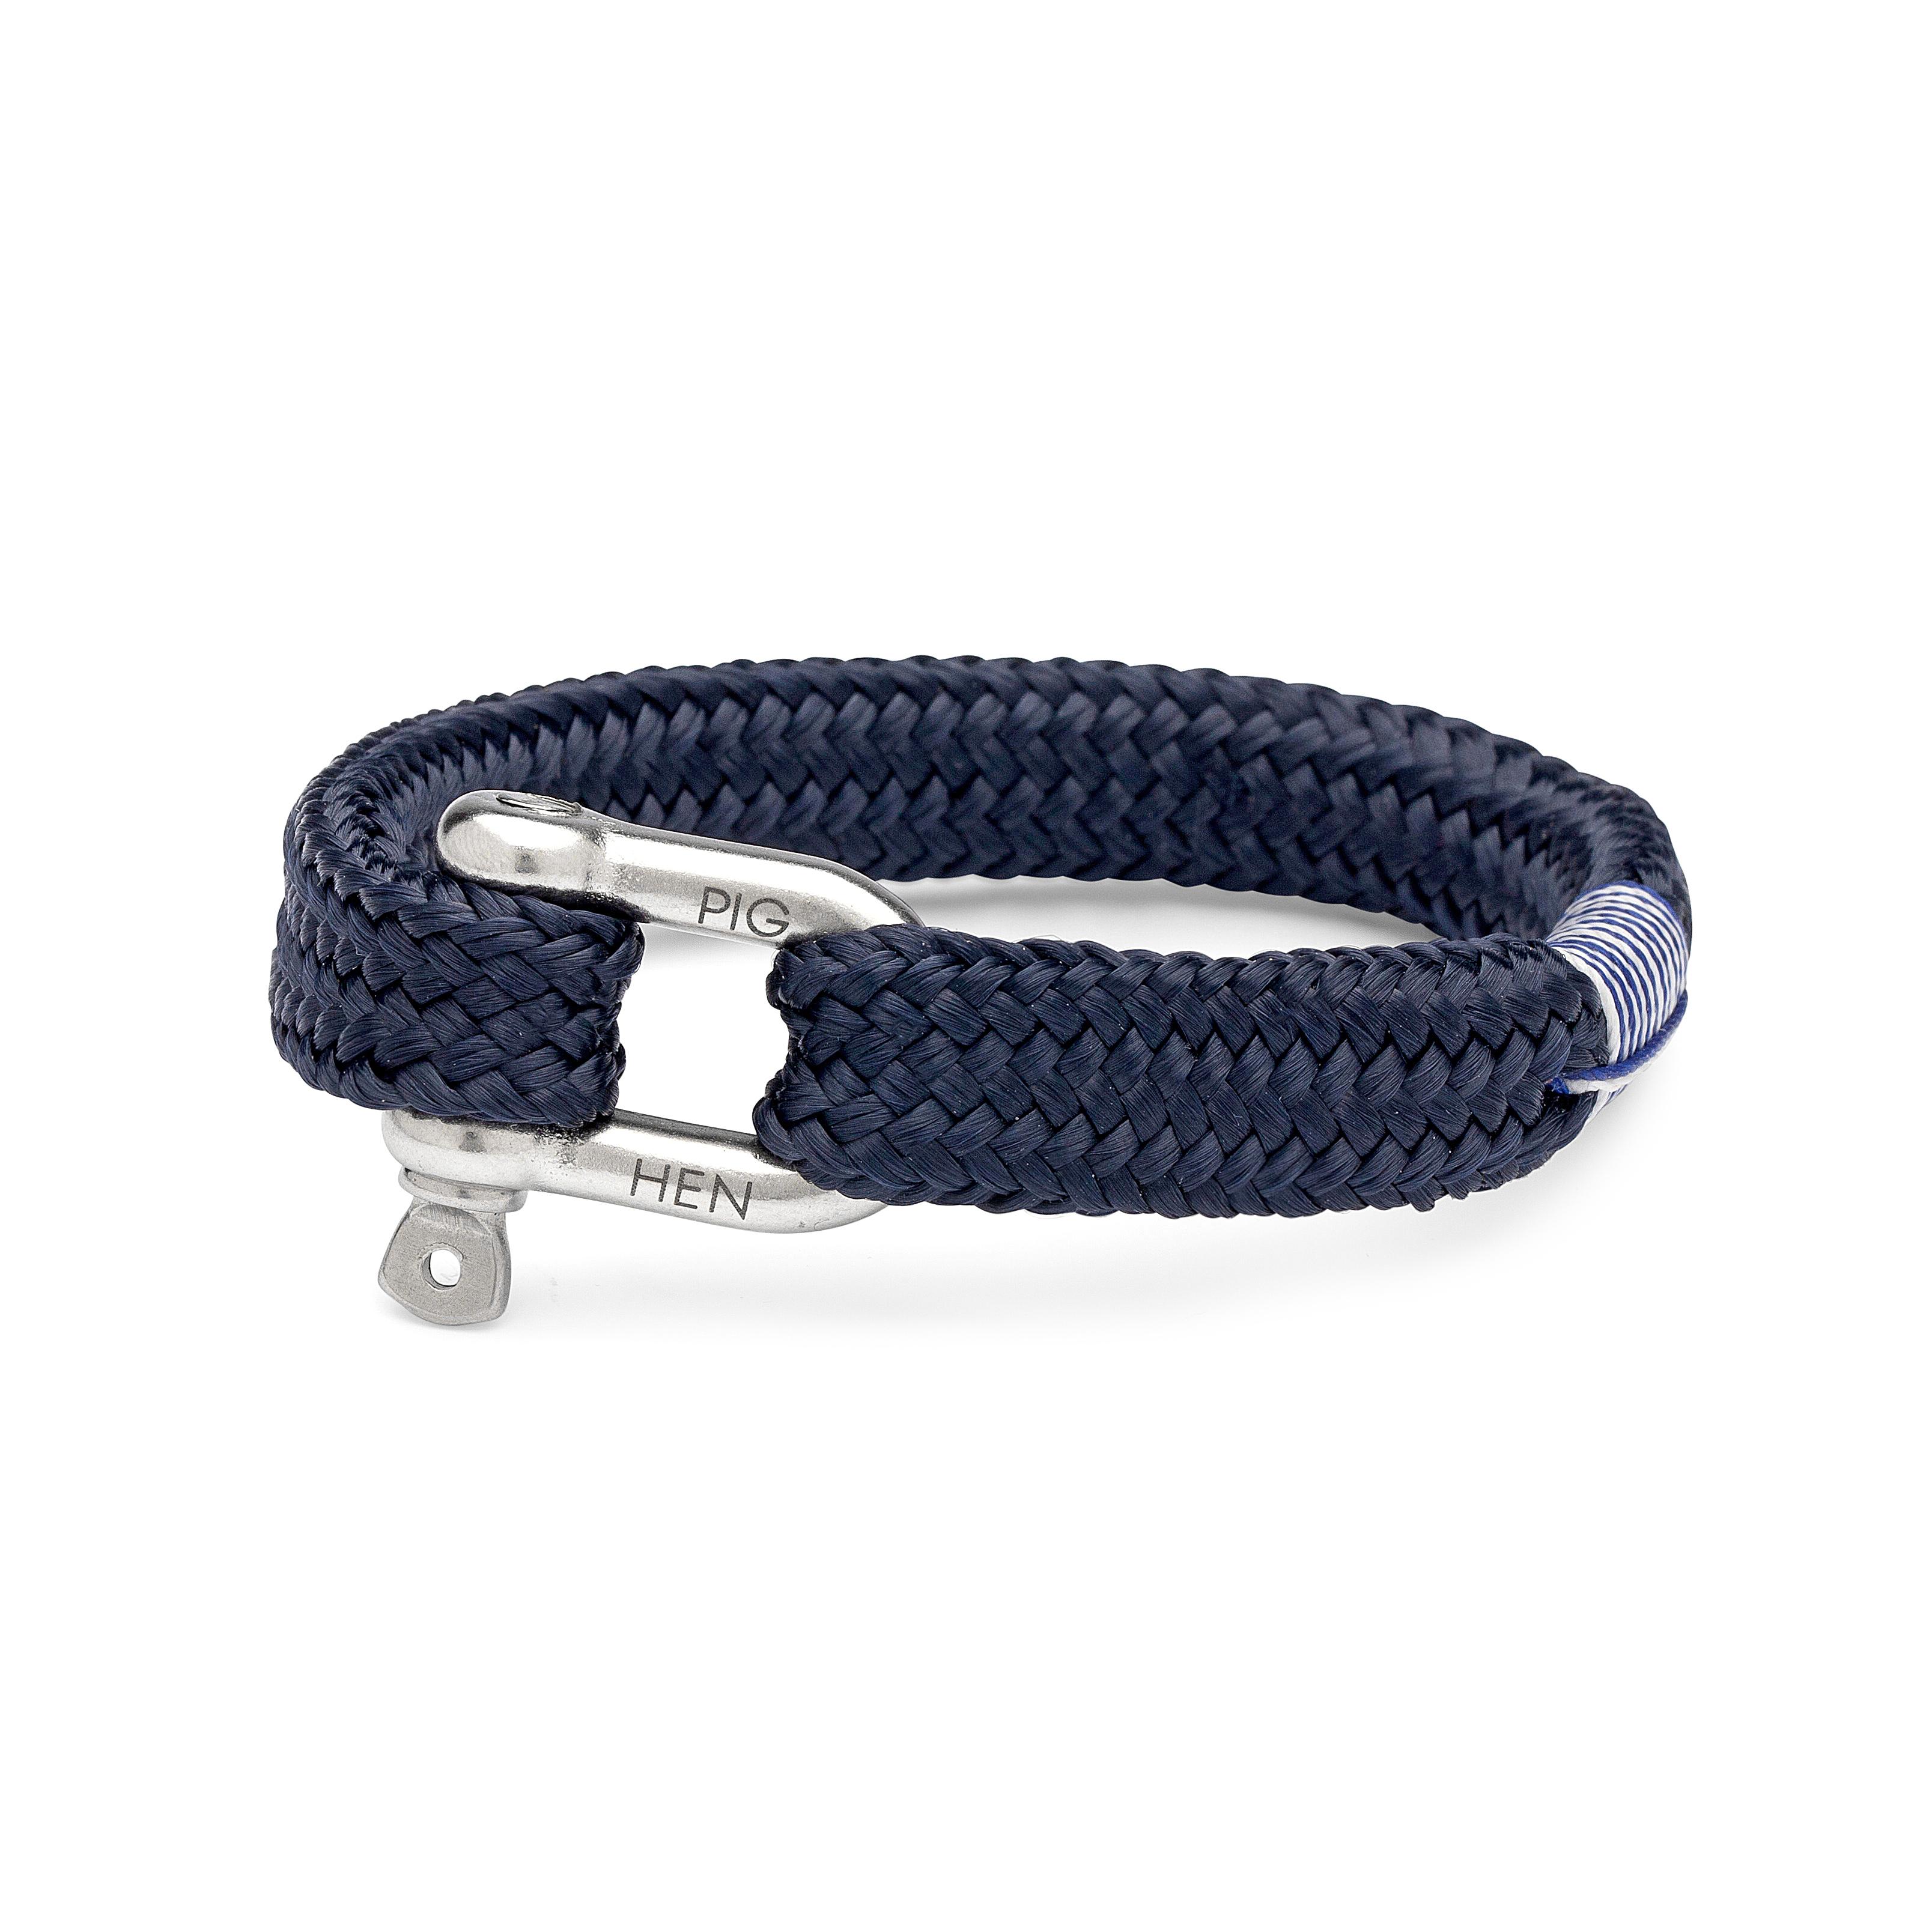 Pig & Hen Armband Blauw